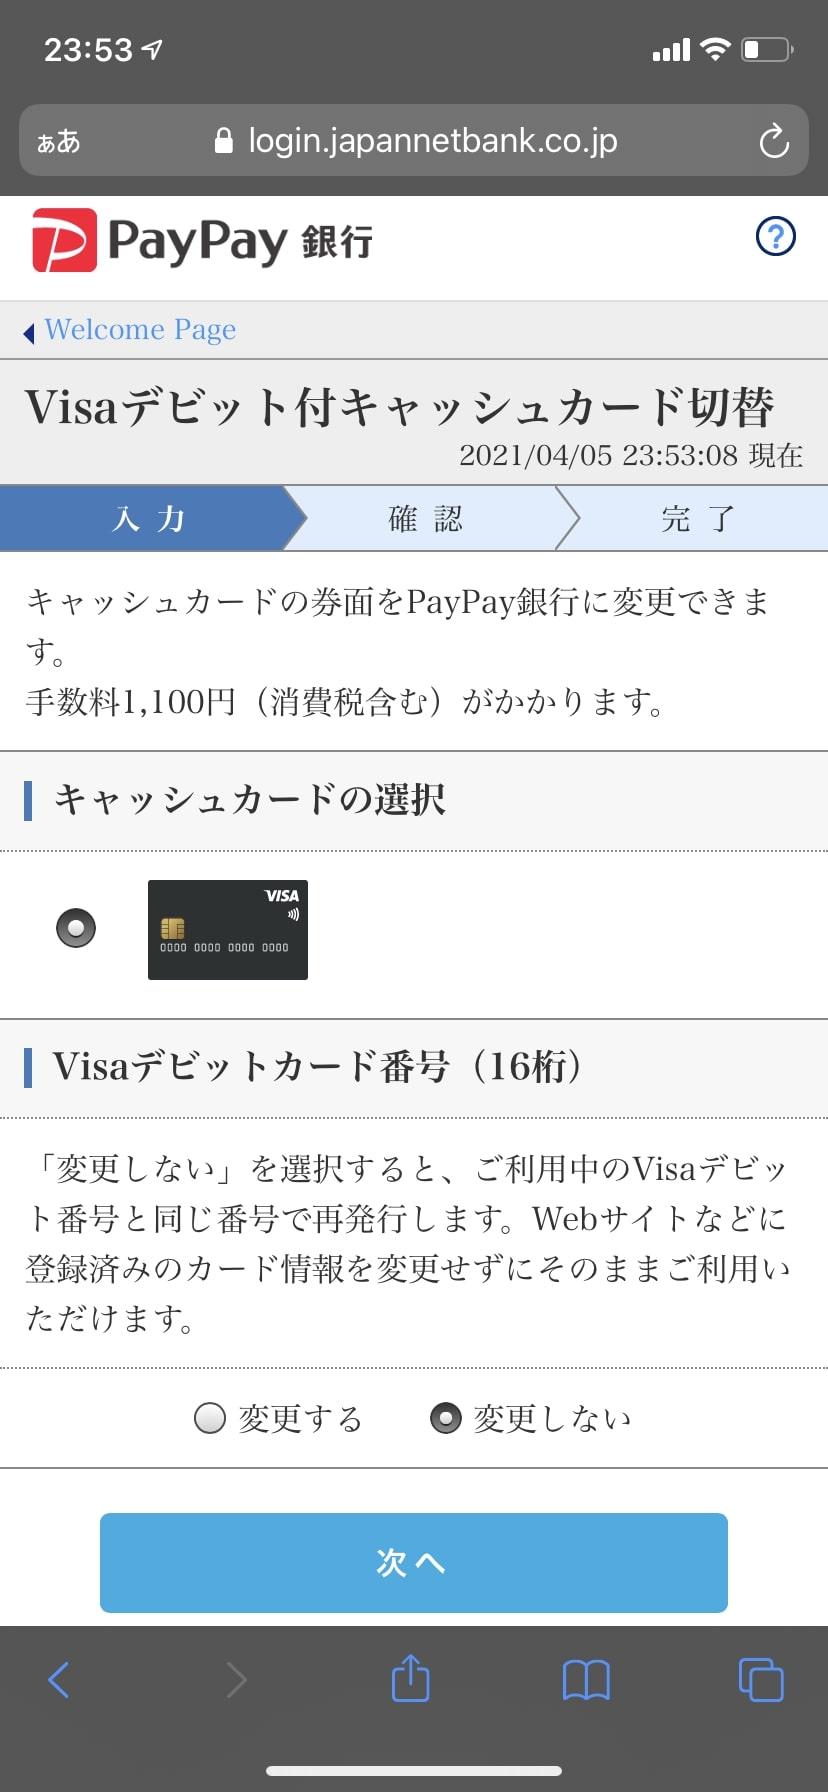 PayPay銀行キャッシュカード切替